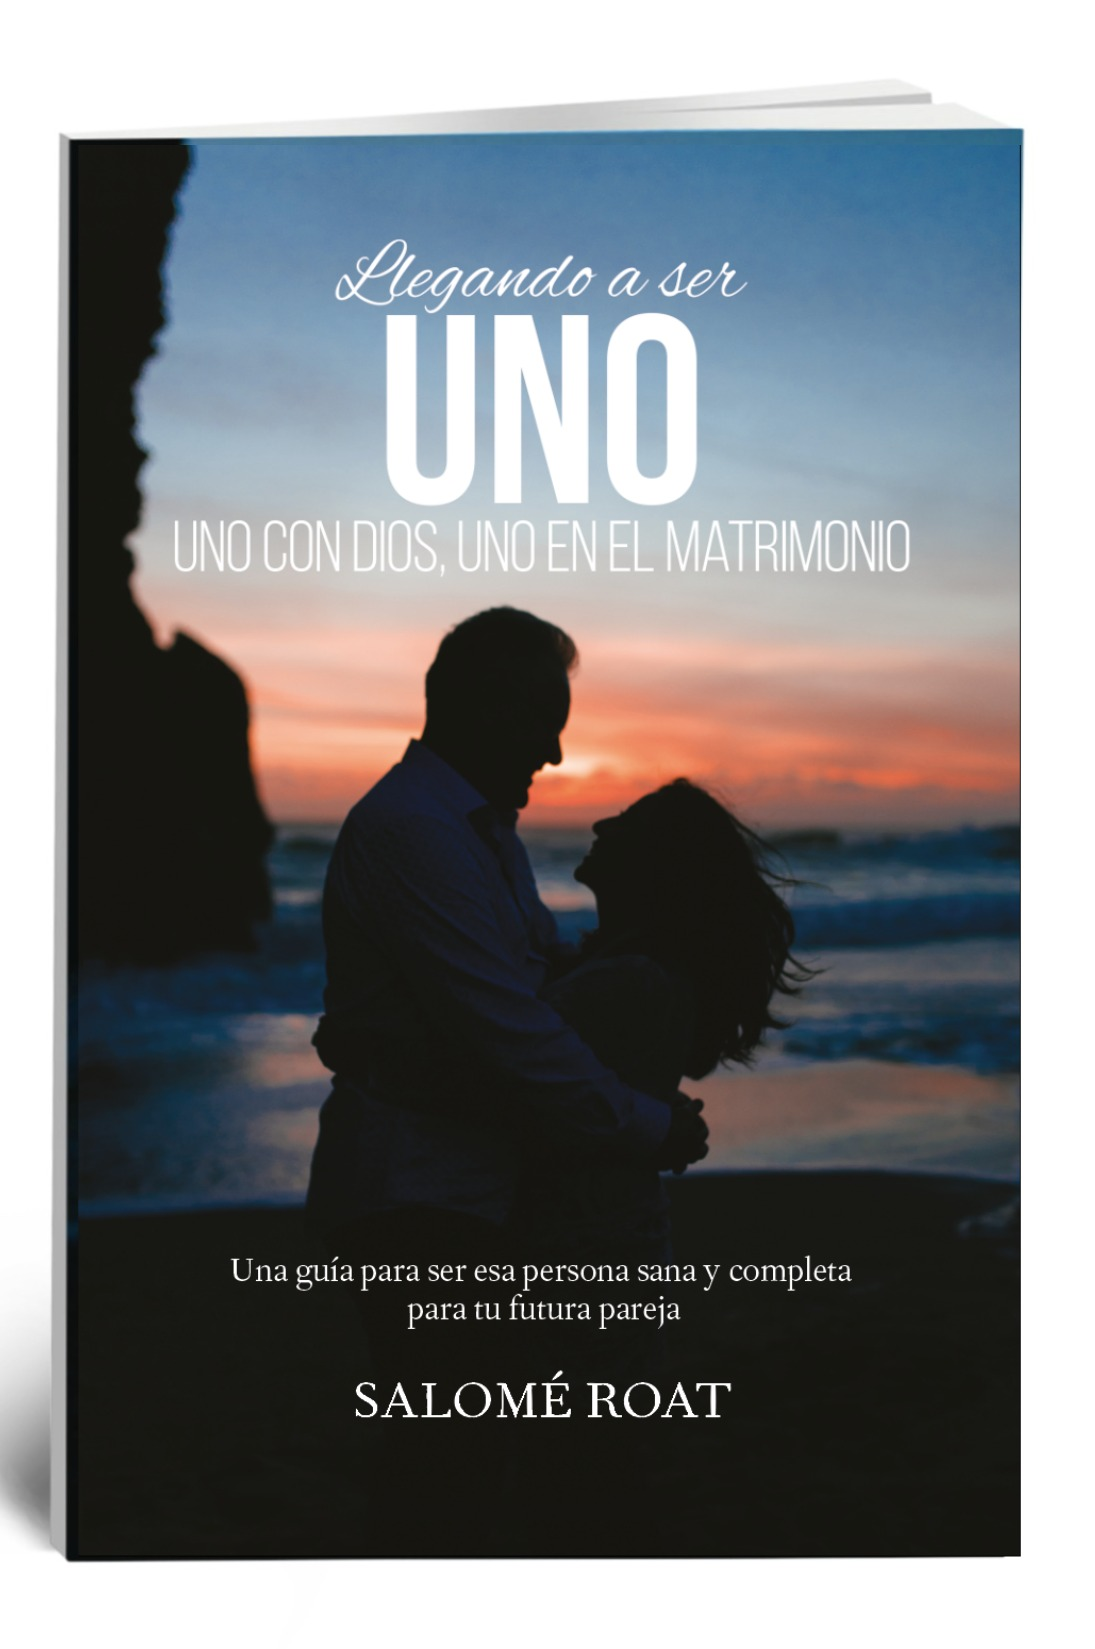 Spanish Book Cover.jpg